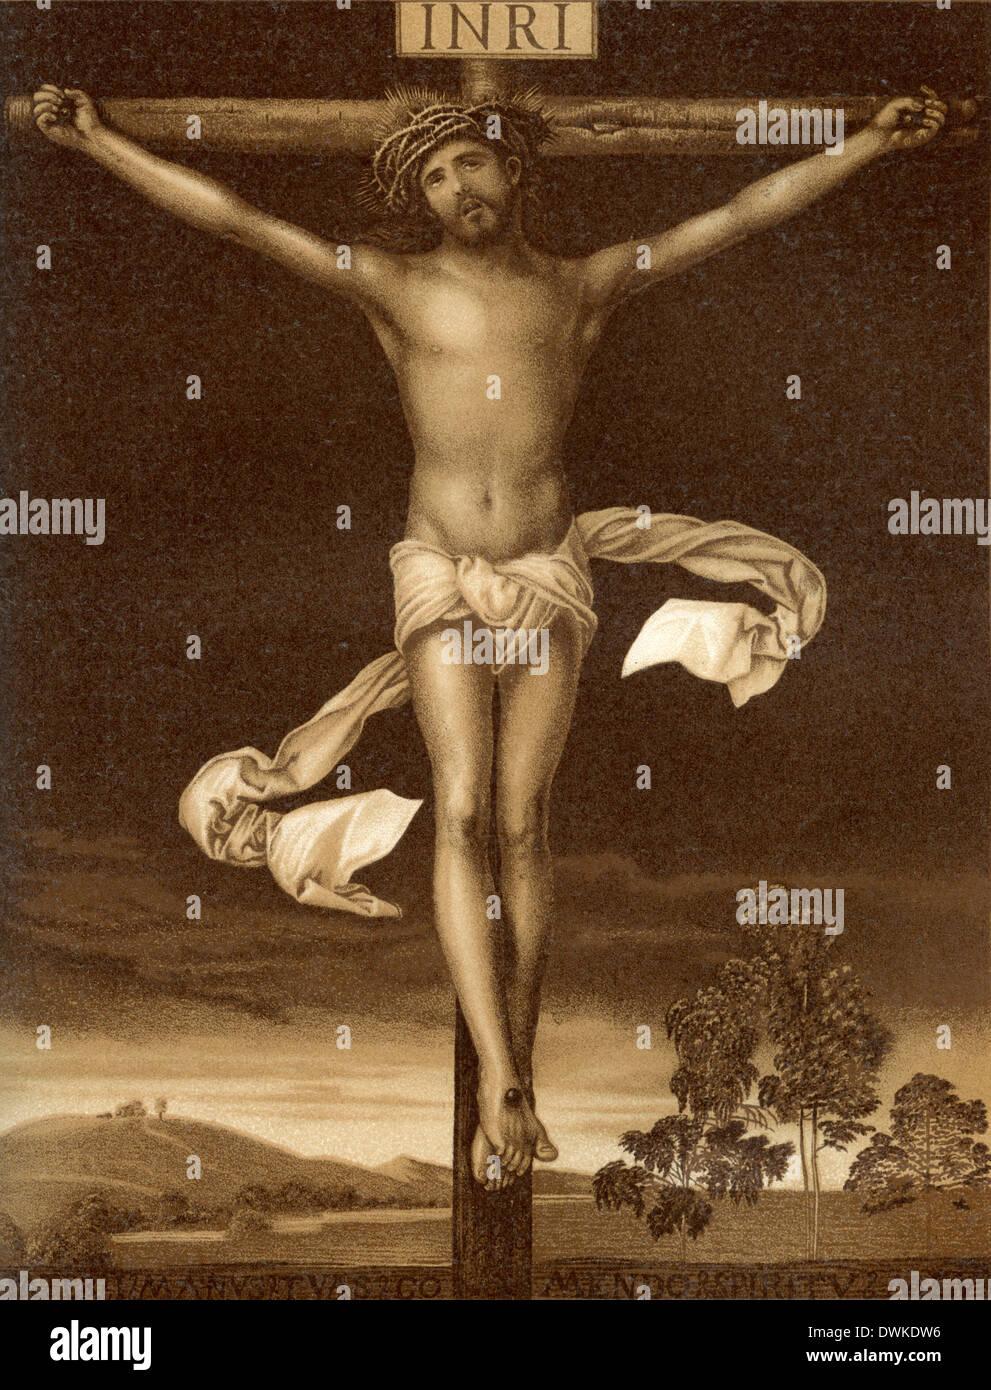 Jesus Christ on the cross. By Albrecht Dürer - Stock Image